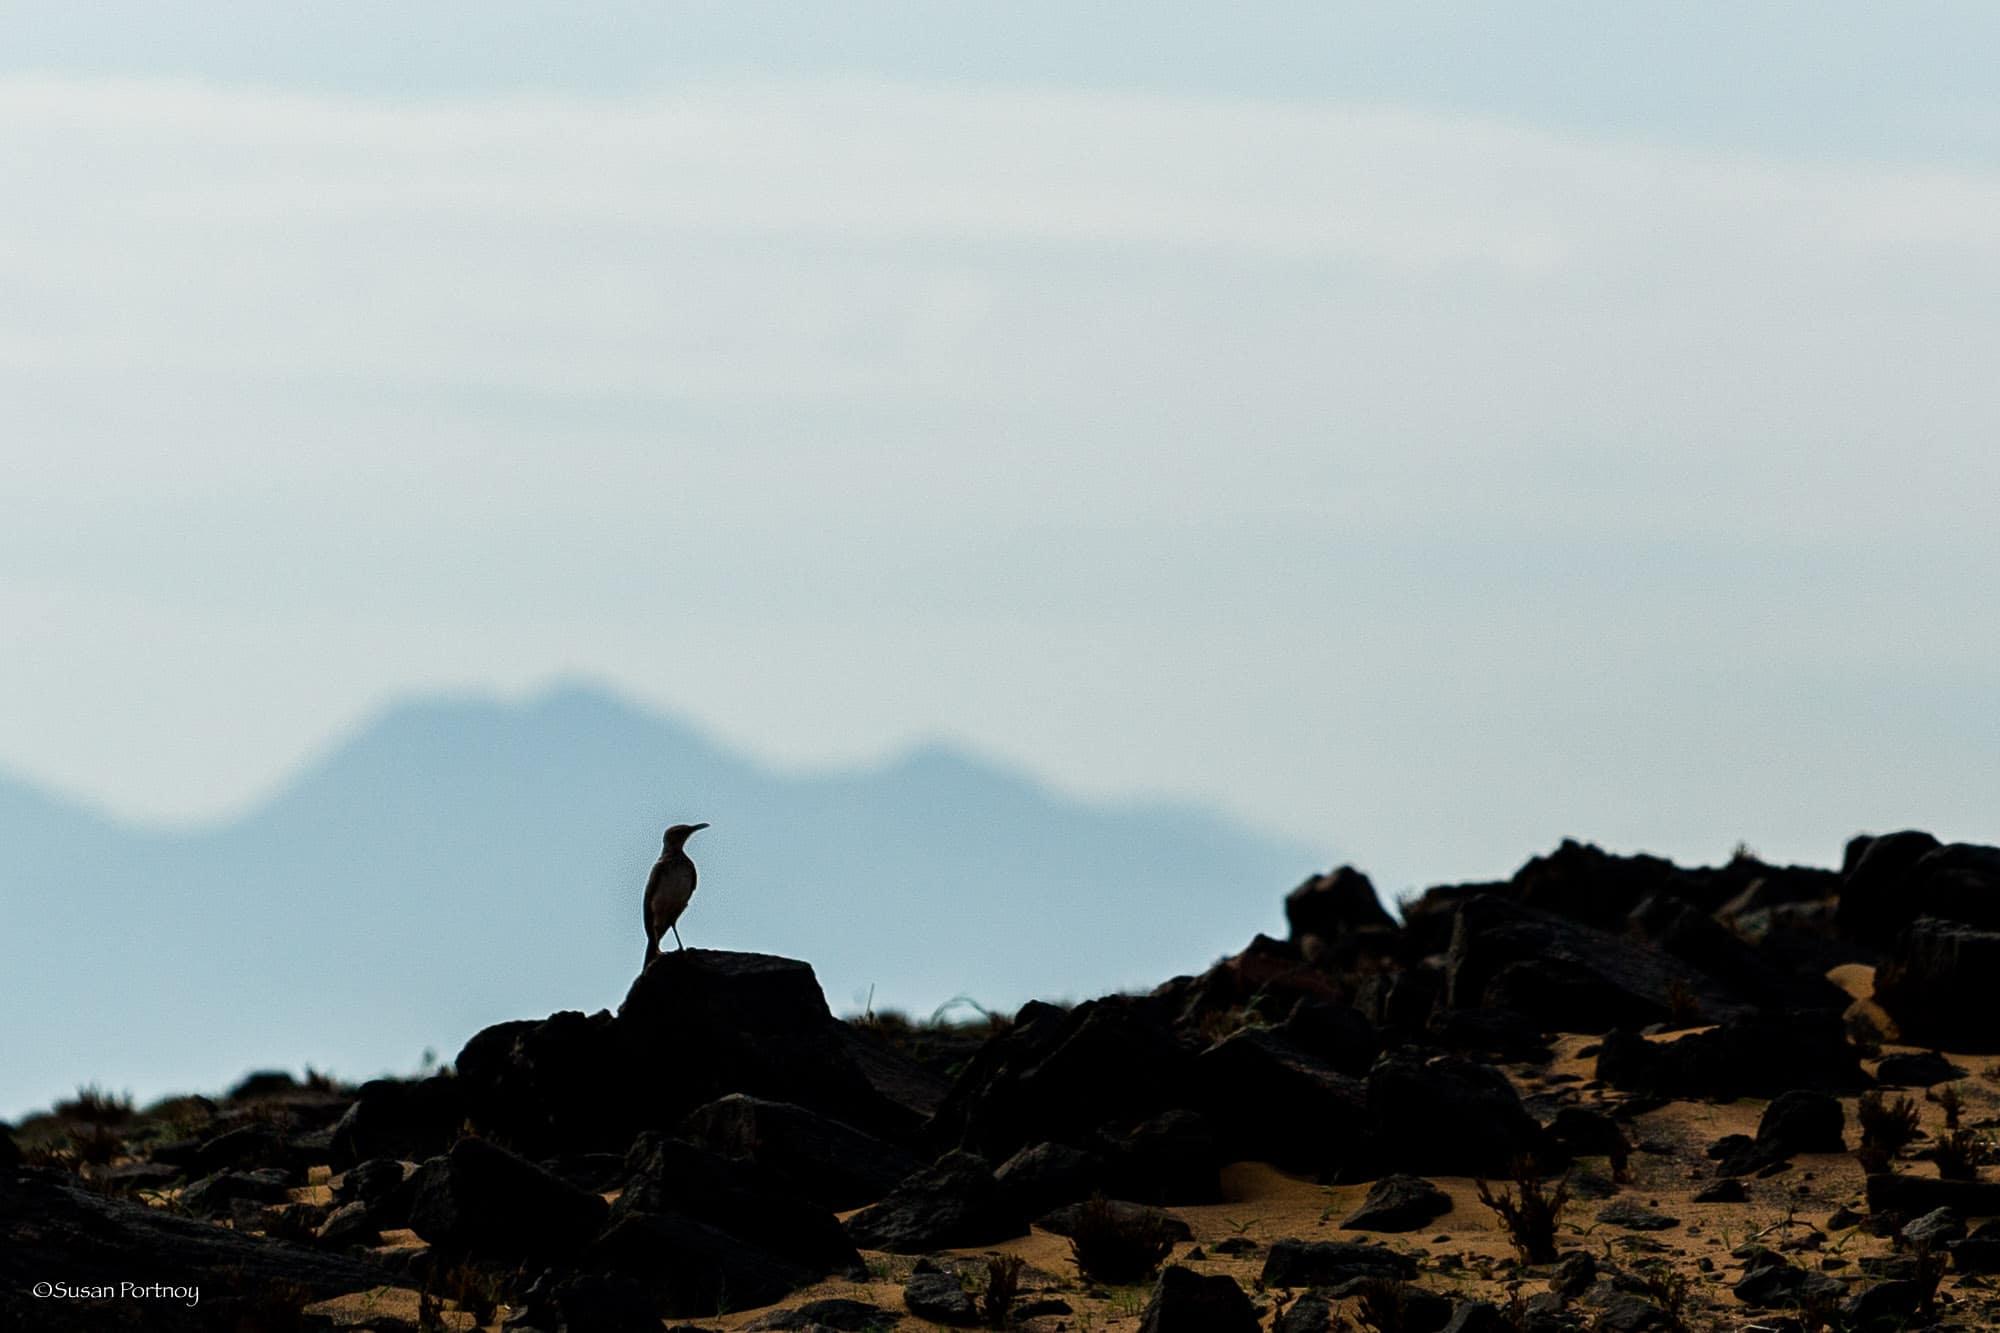 Tiny bird in Silhouette at Serra Cafema in Namibia